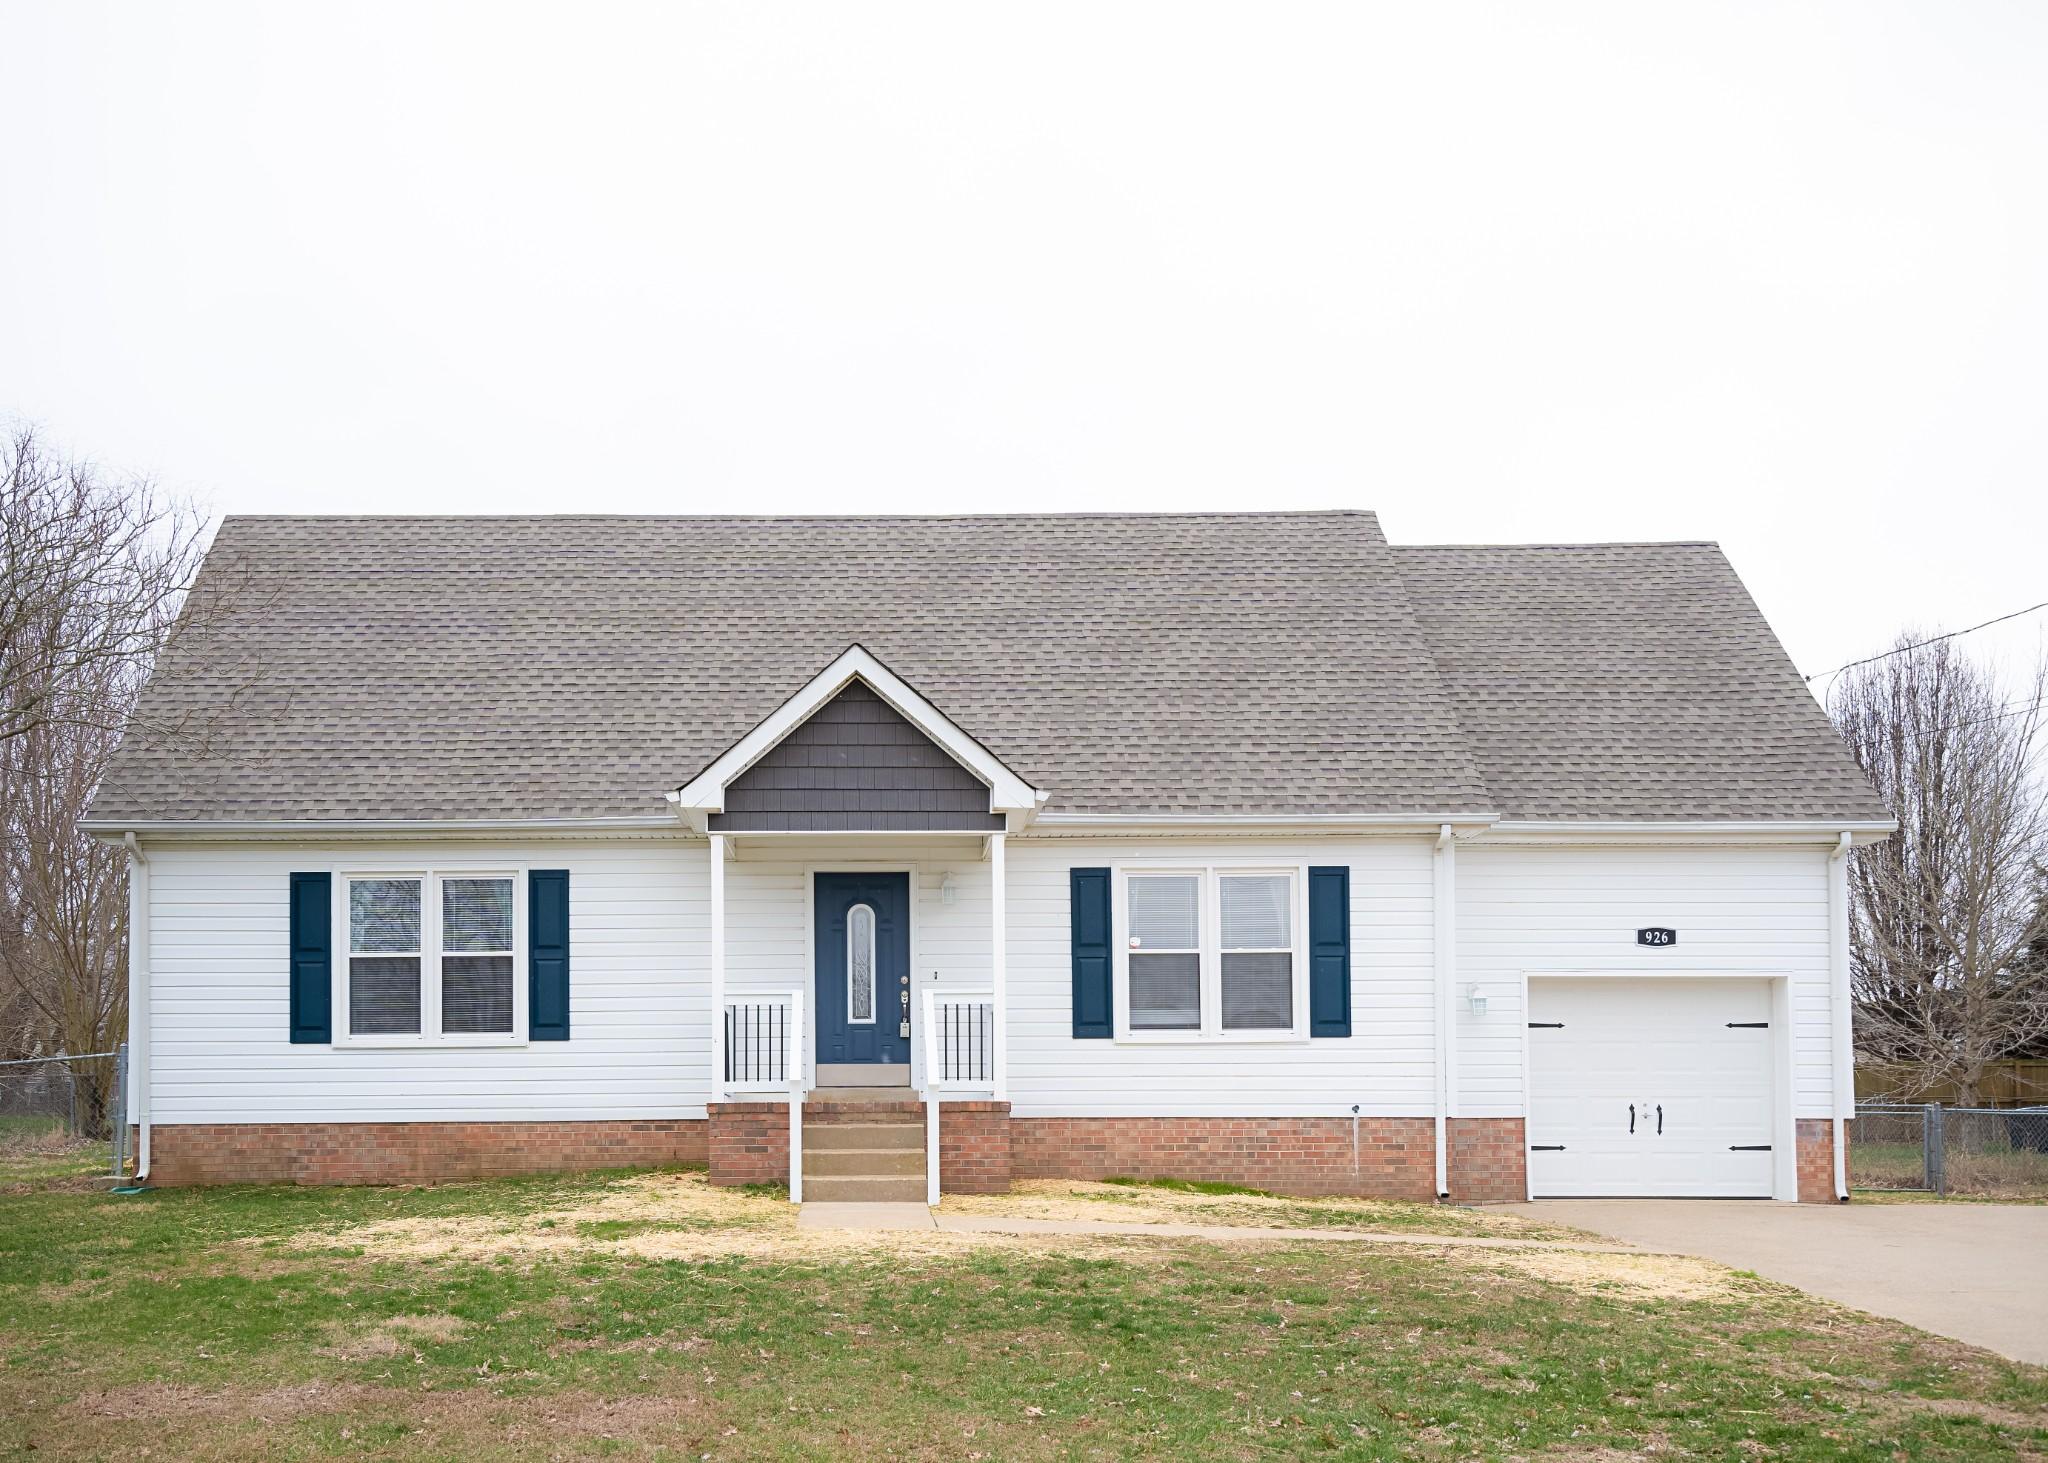 926 Arrow CIR, Oak Grove, KY 42262 - Oak Grove, KY real estate listing